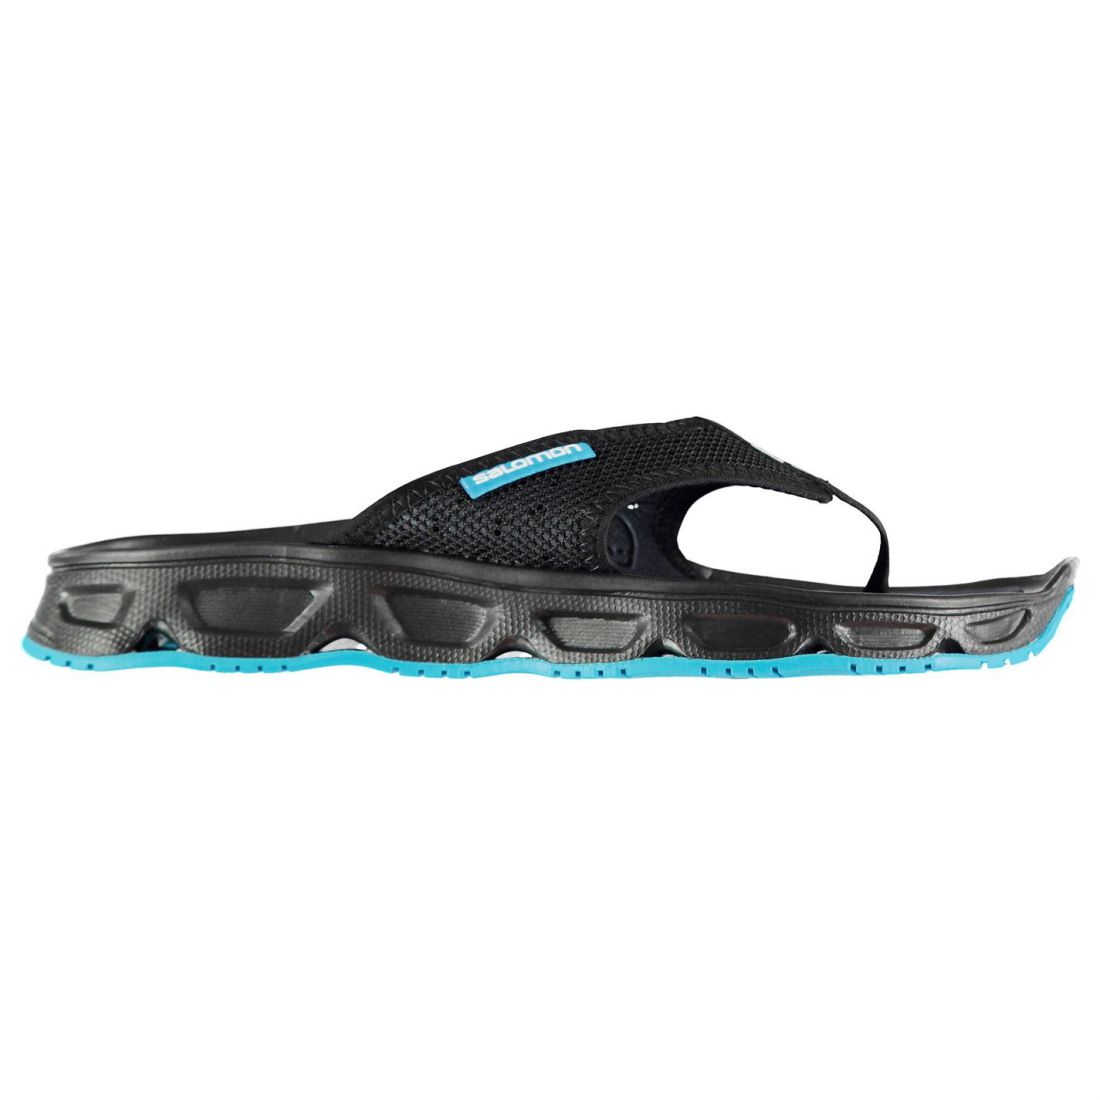 62e40f0e01752c Salomon RX Break Sandals Mens Gents Oversized